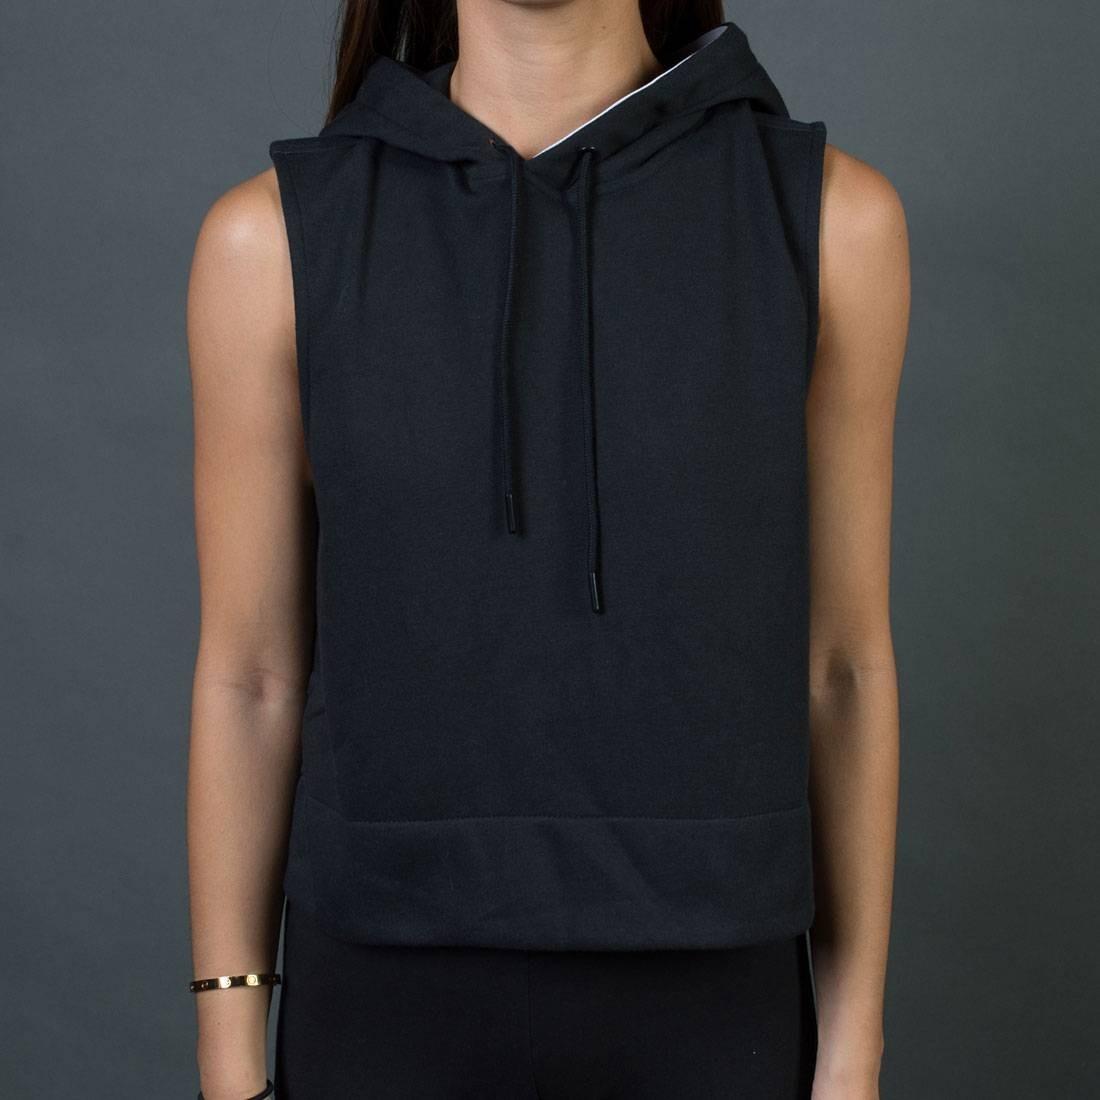 Adidas Women Sleeveless Pullover Hoodie (black)